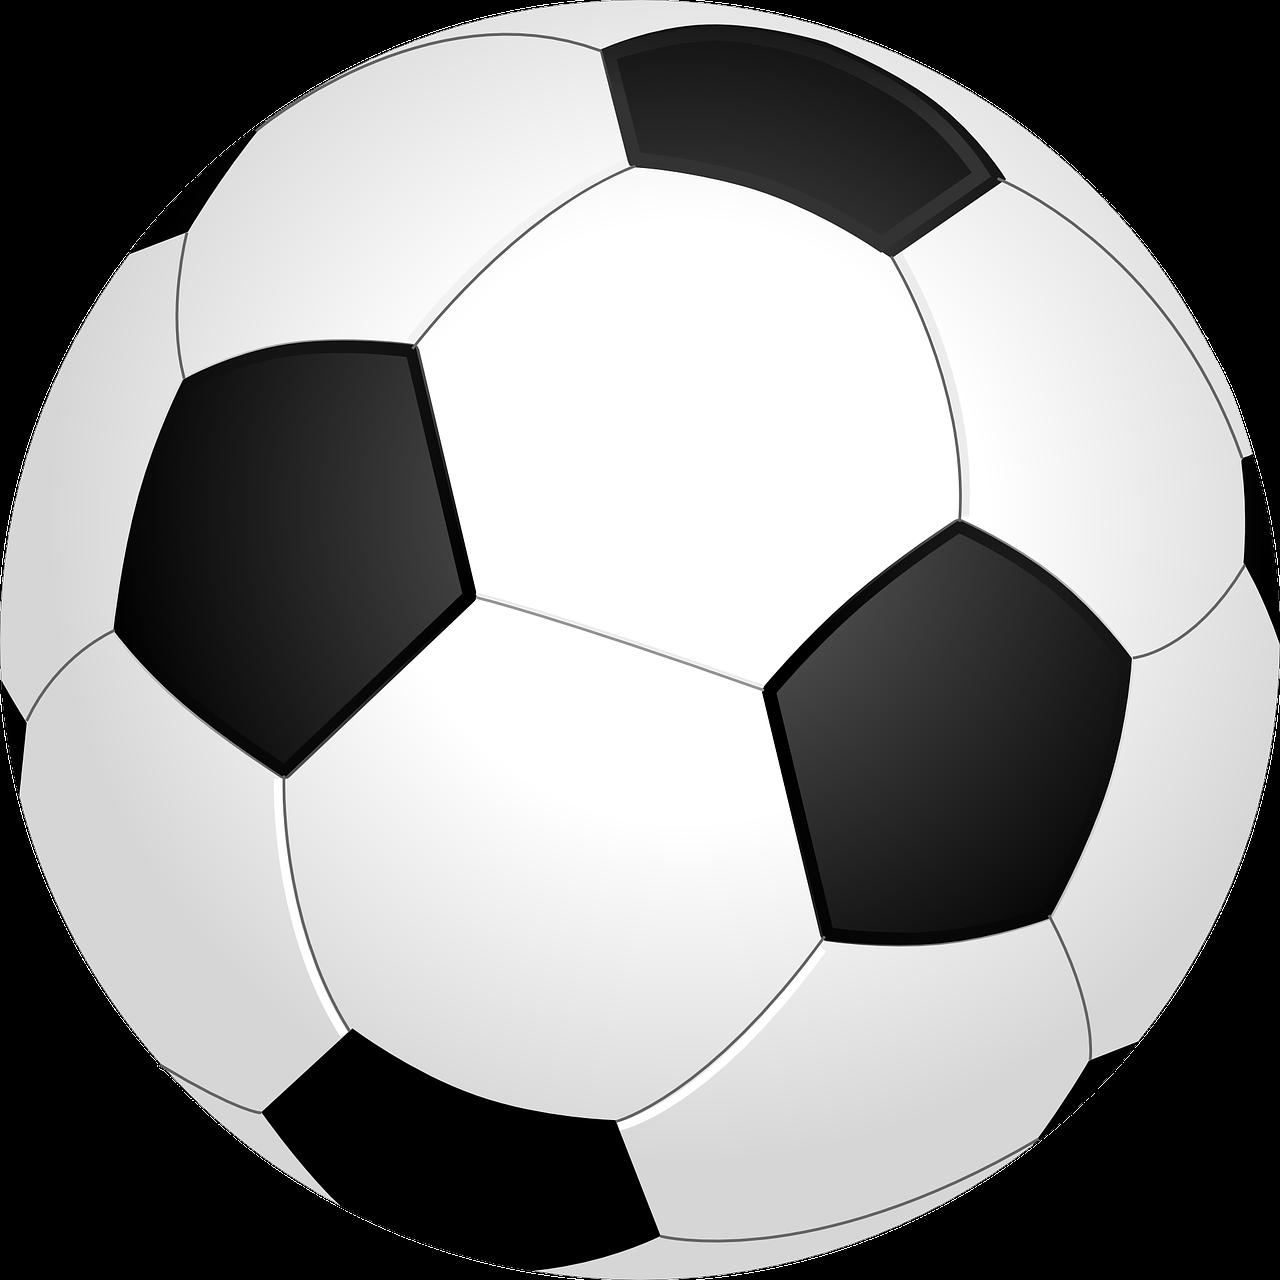 football, ball, sport-157930.jpg